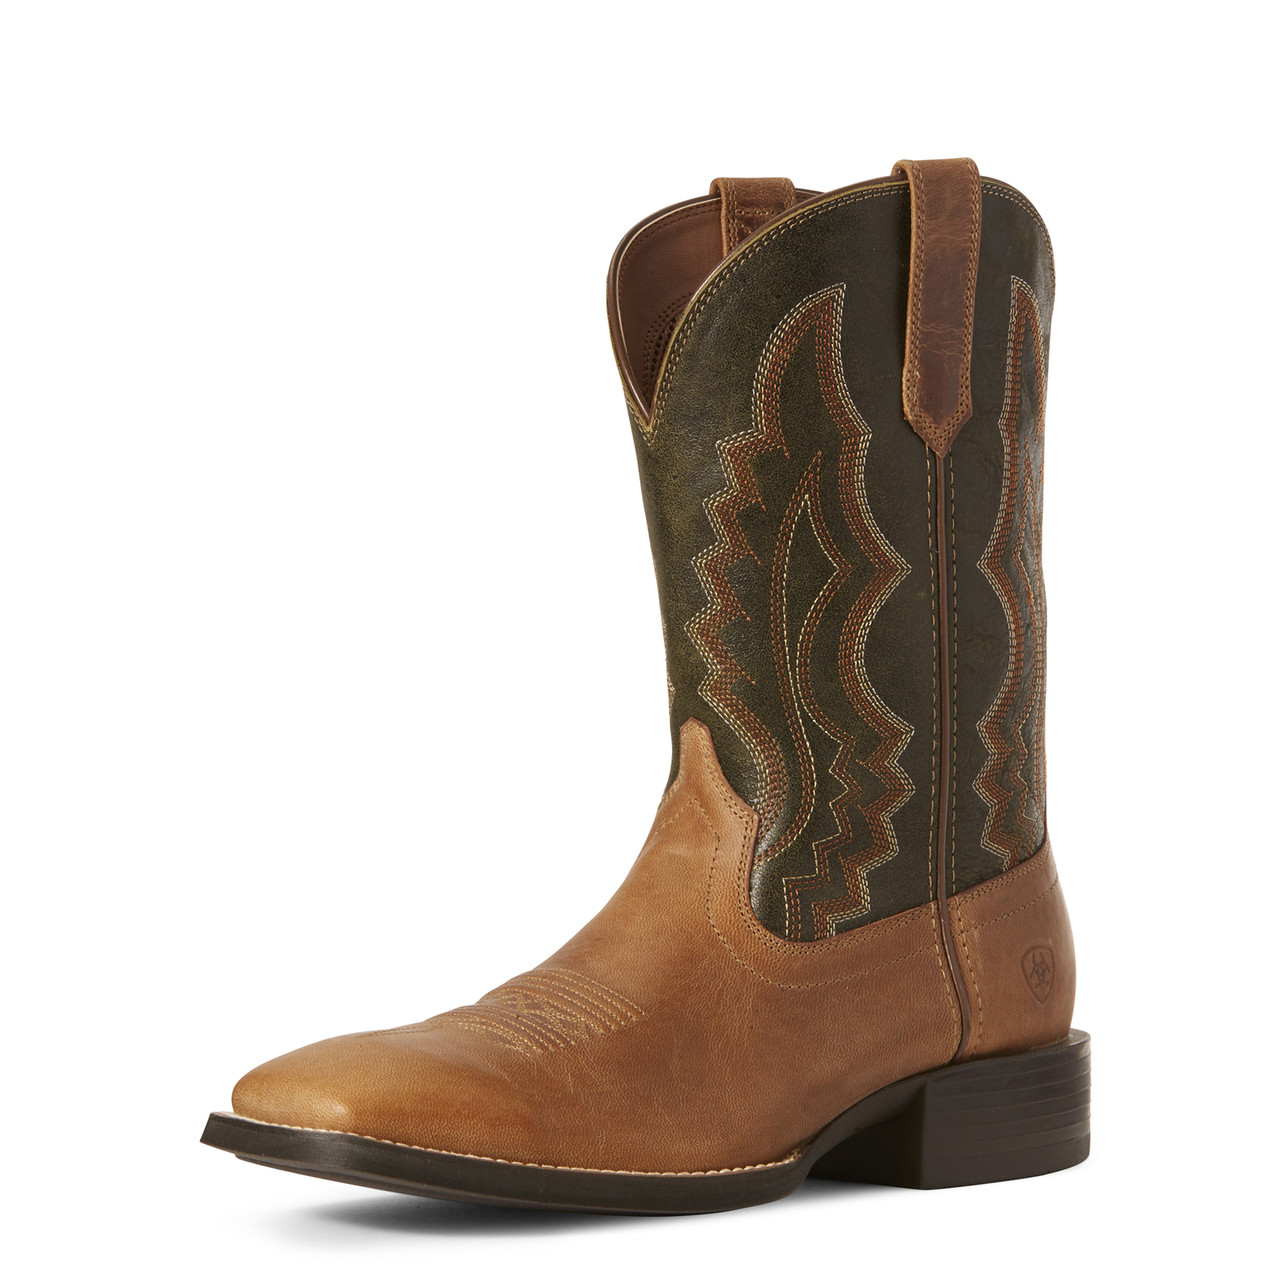 913389fed31 Ariat Men's Sport Riggin Brown Cowboy Boots 10027207 - Jackson's Western